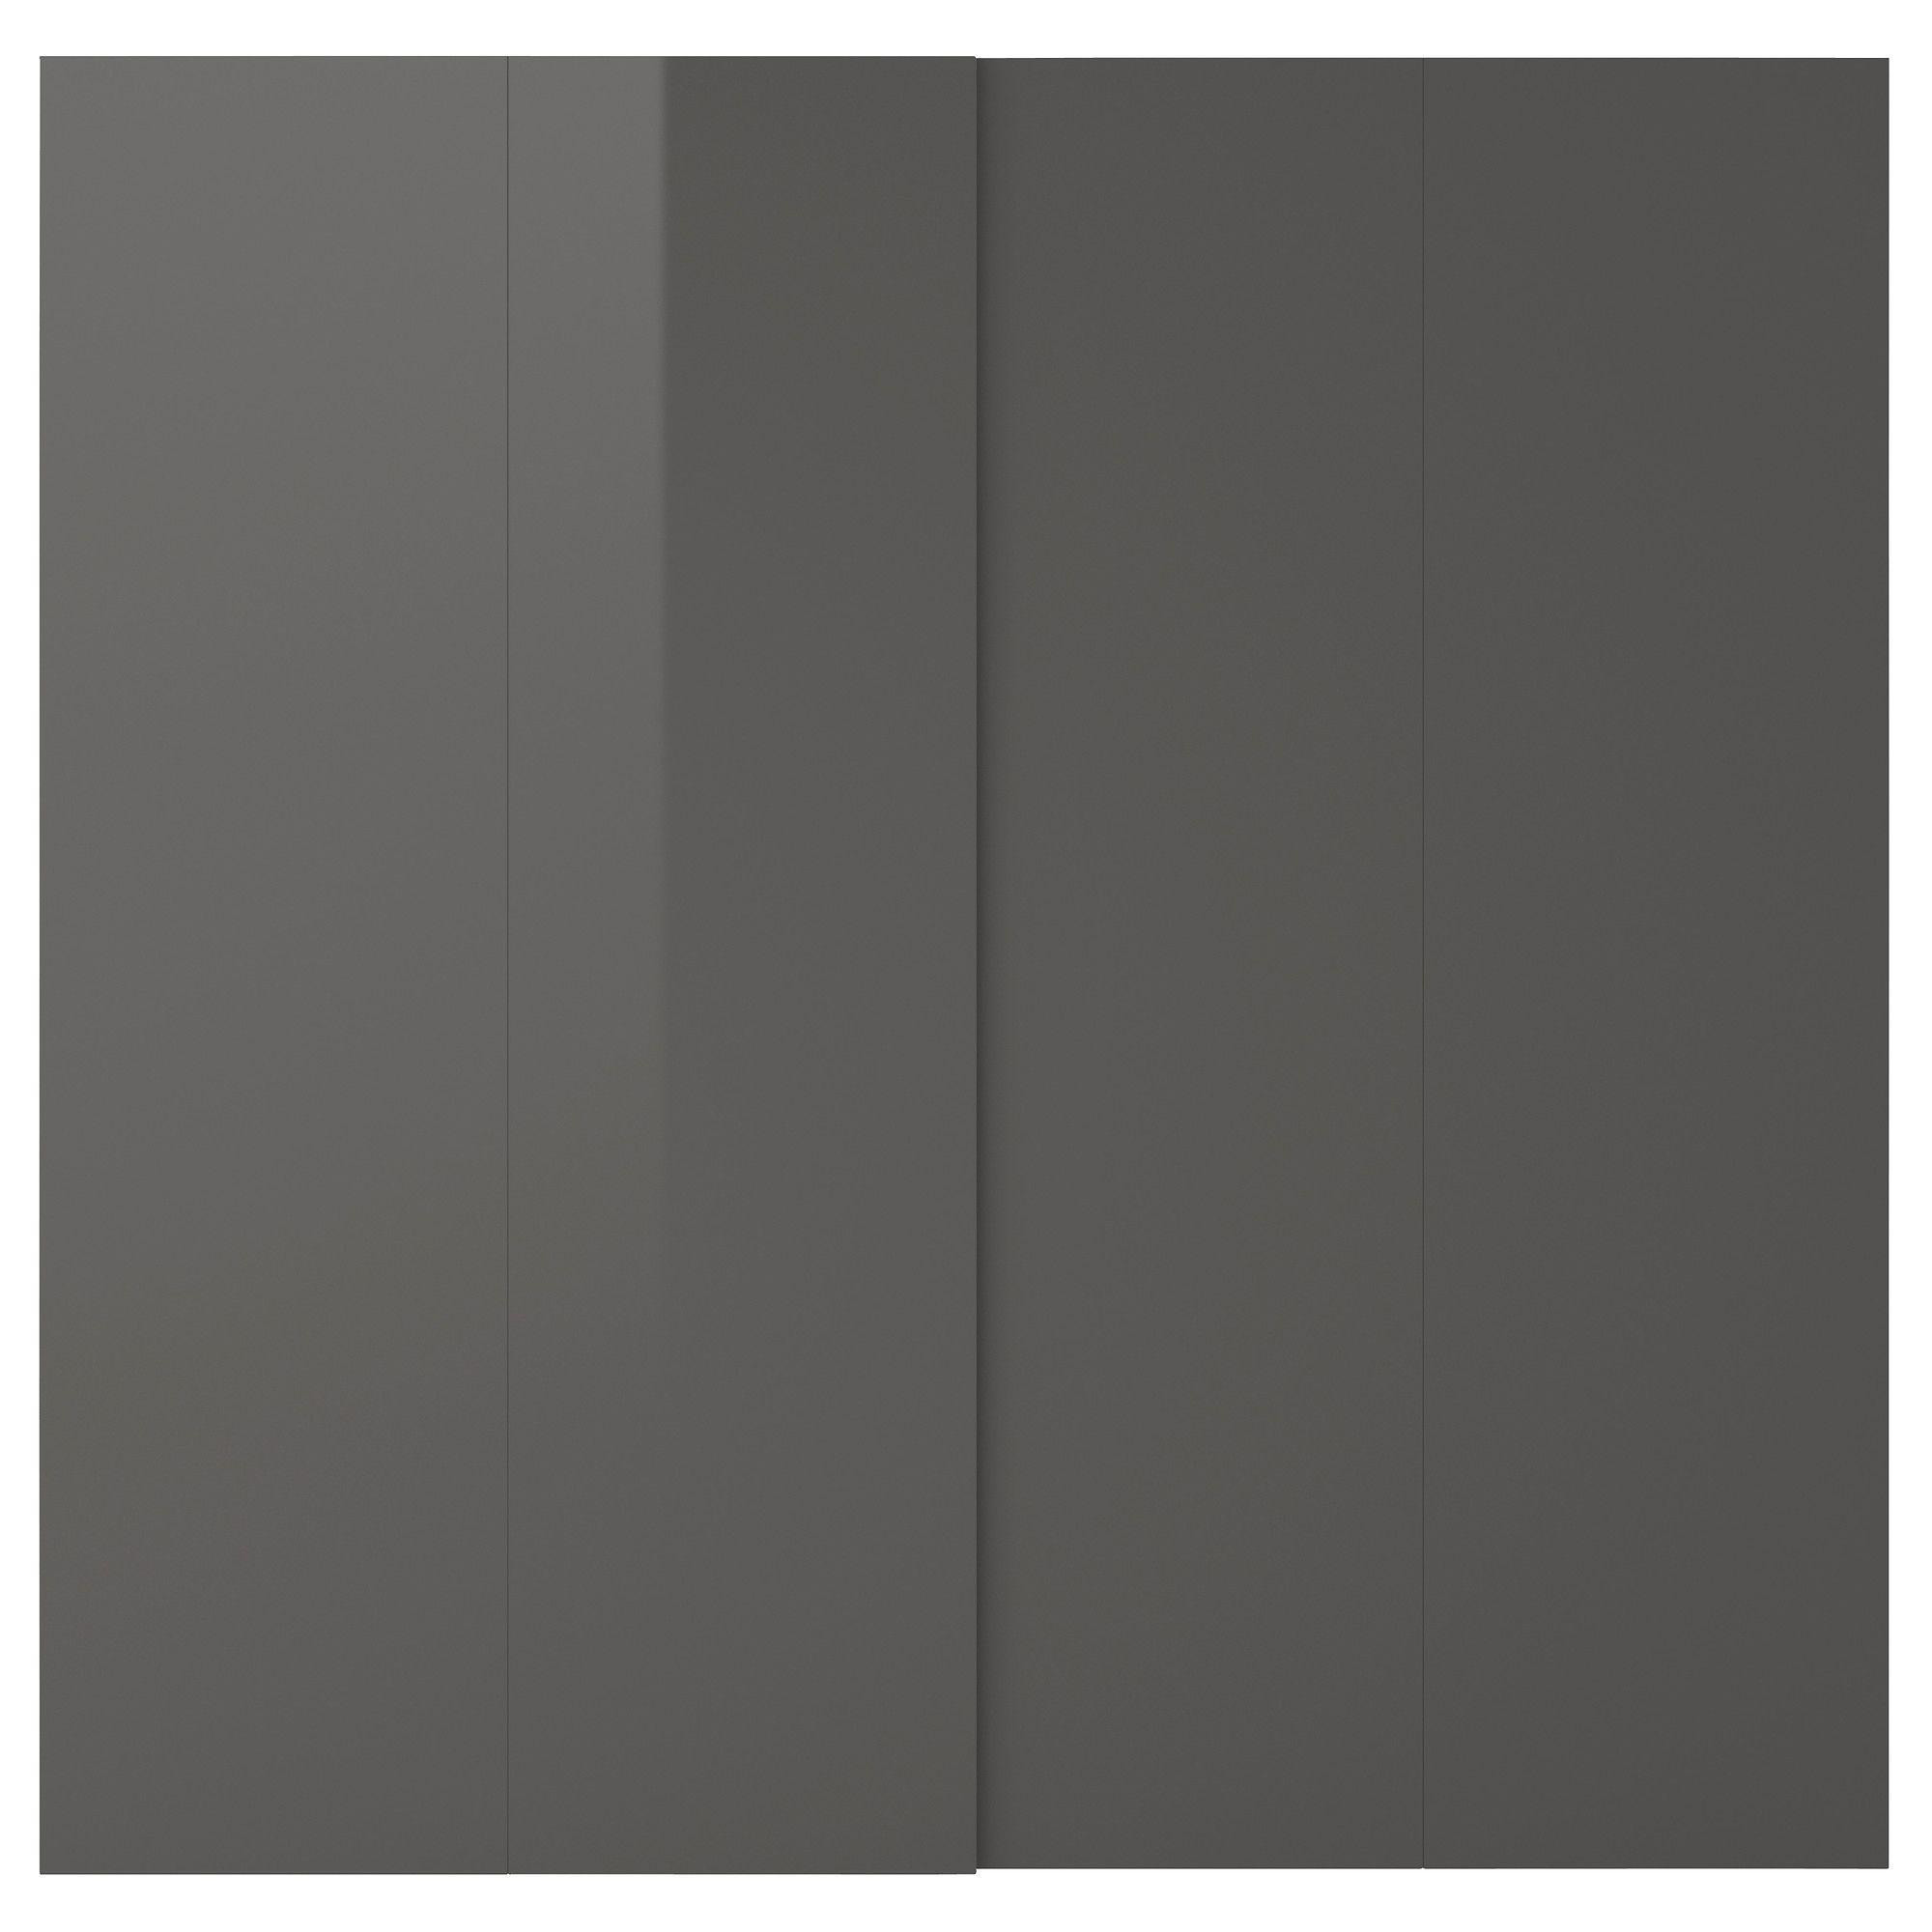 pax hasvik jeu 2 ptes coul 200x236 cm ikea p15b 0113 pinterest d co. Black Bedroom Furniture Sets. Home Design Ideas